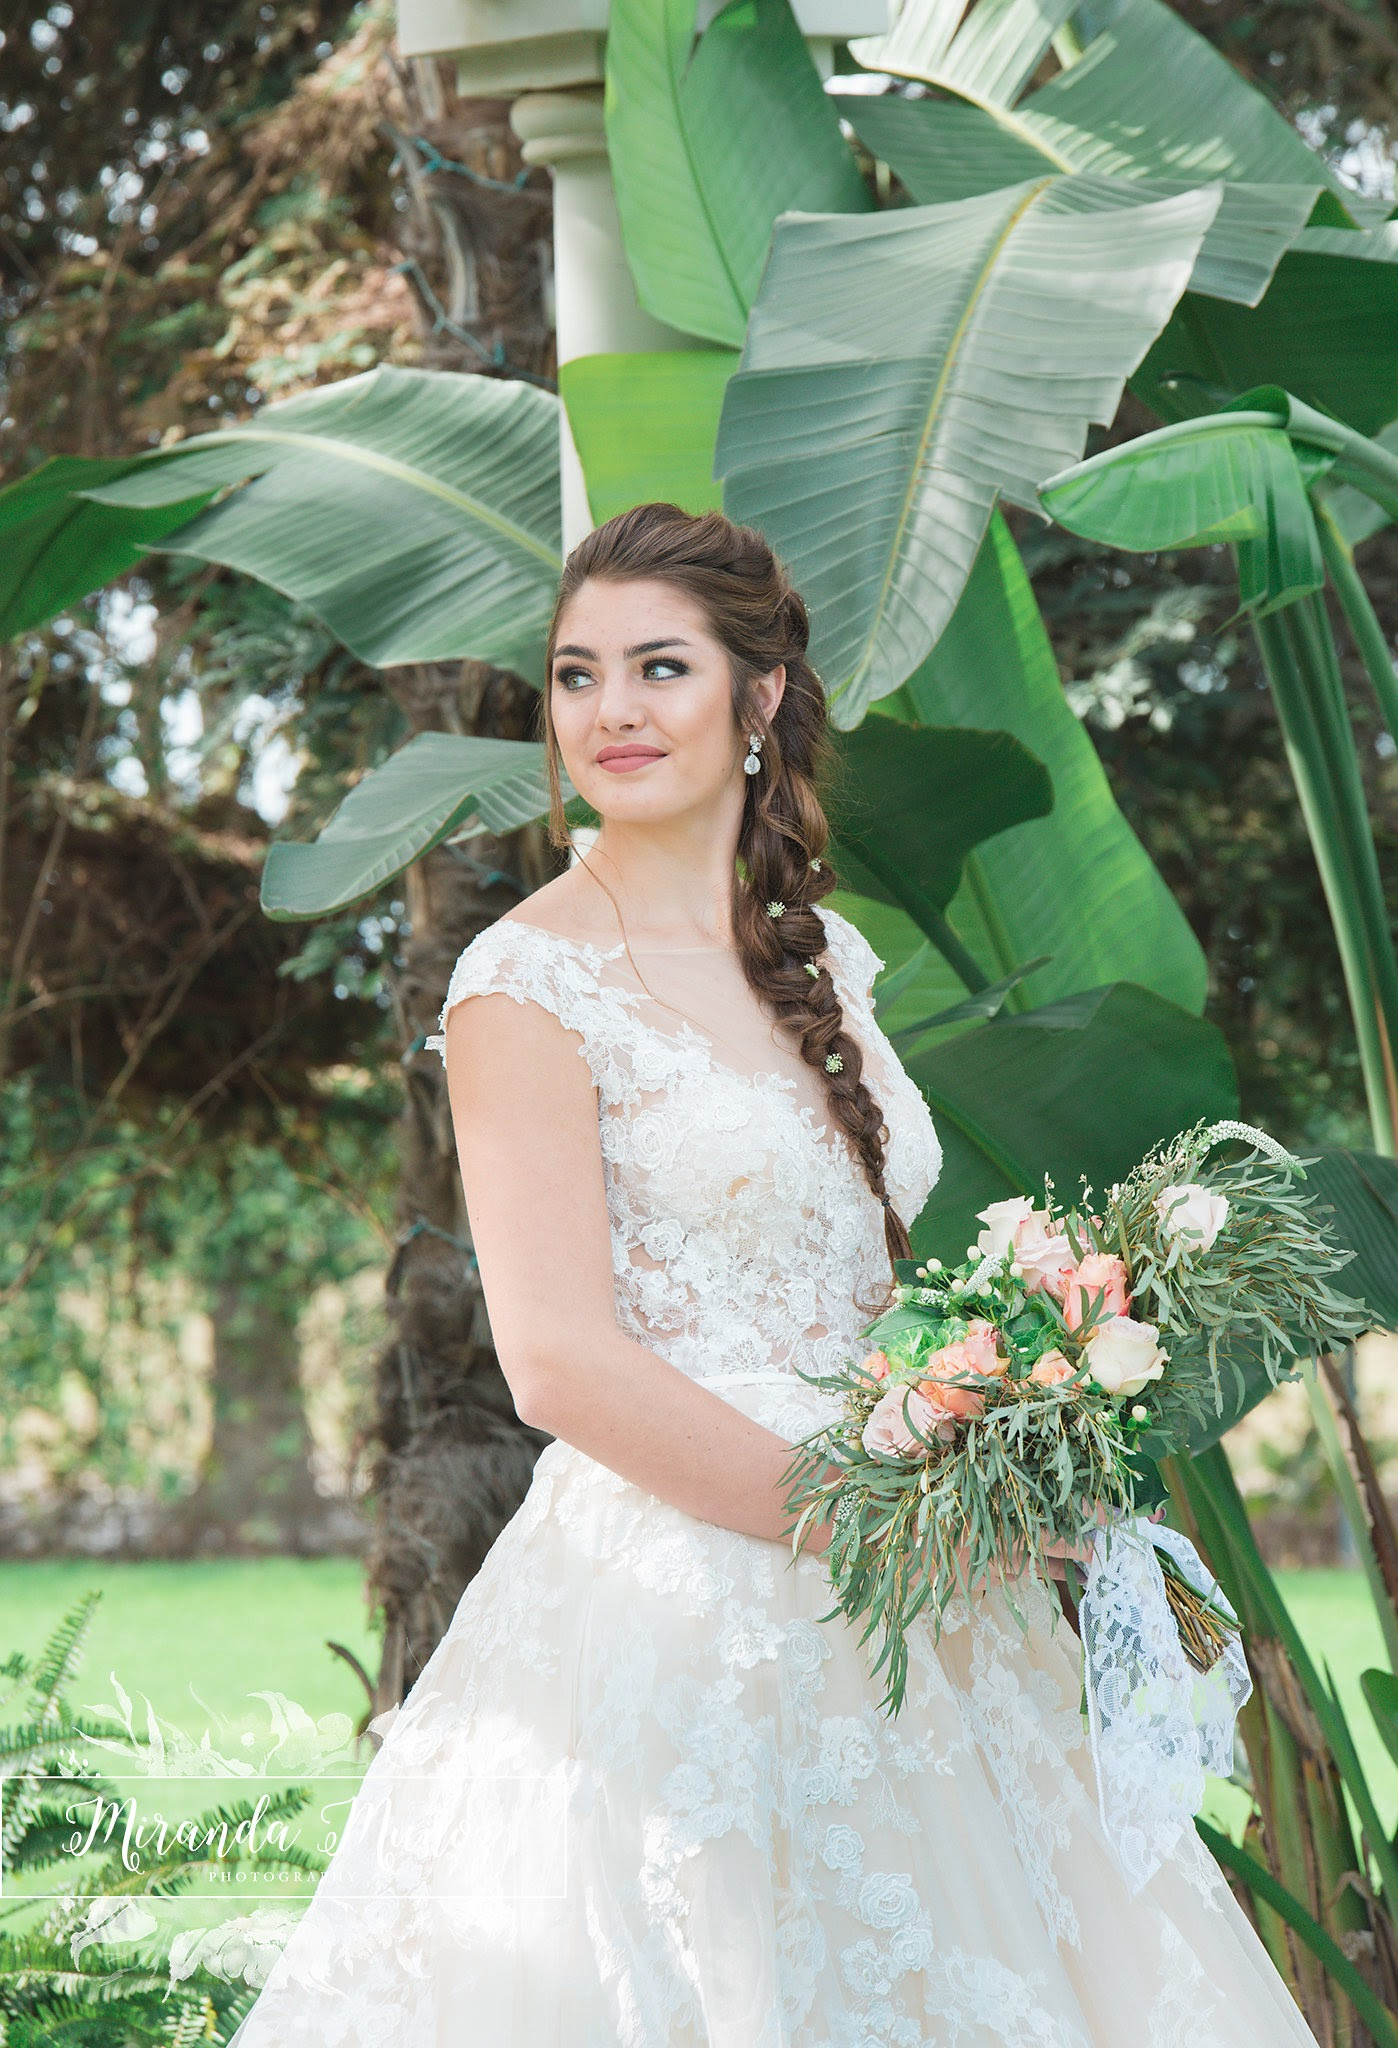 Bridal Earrings - Romantic Wedding